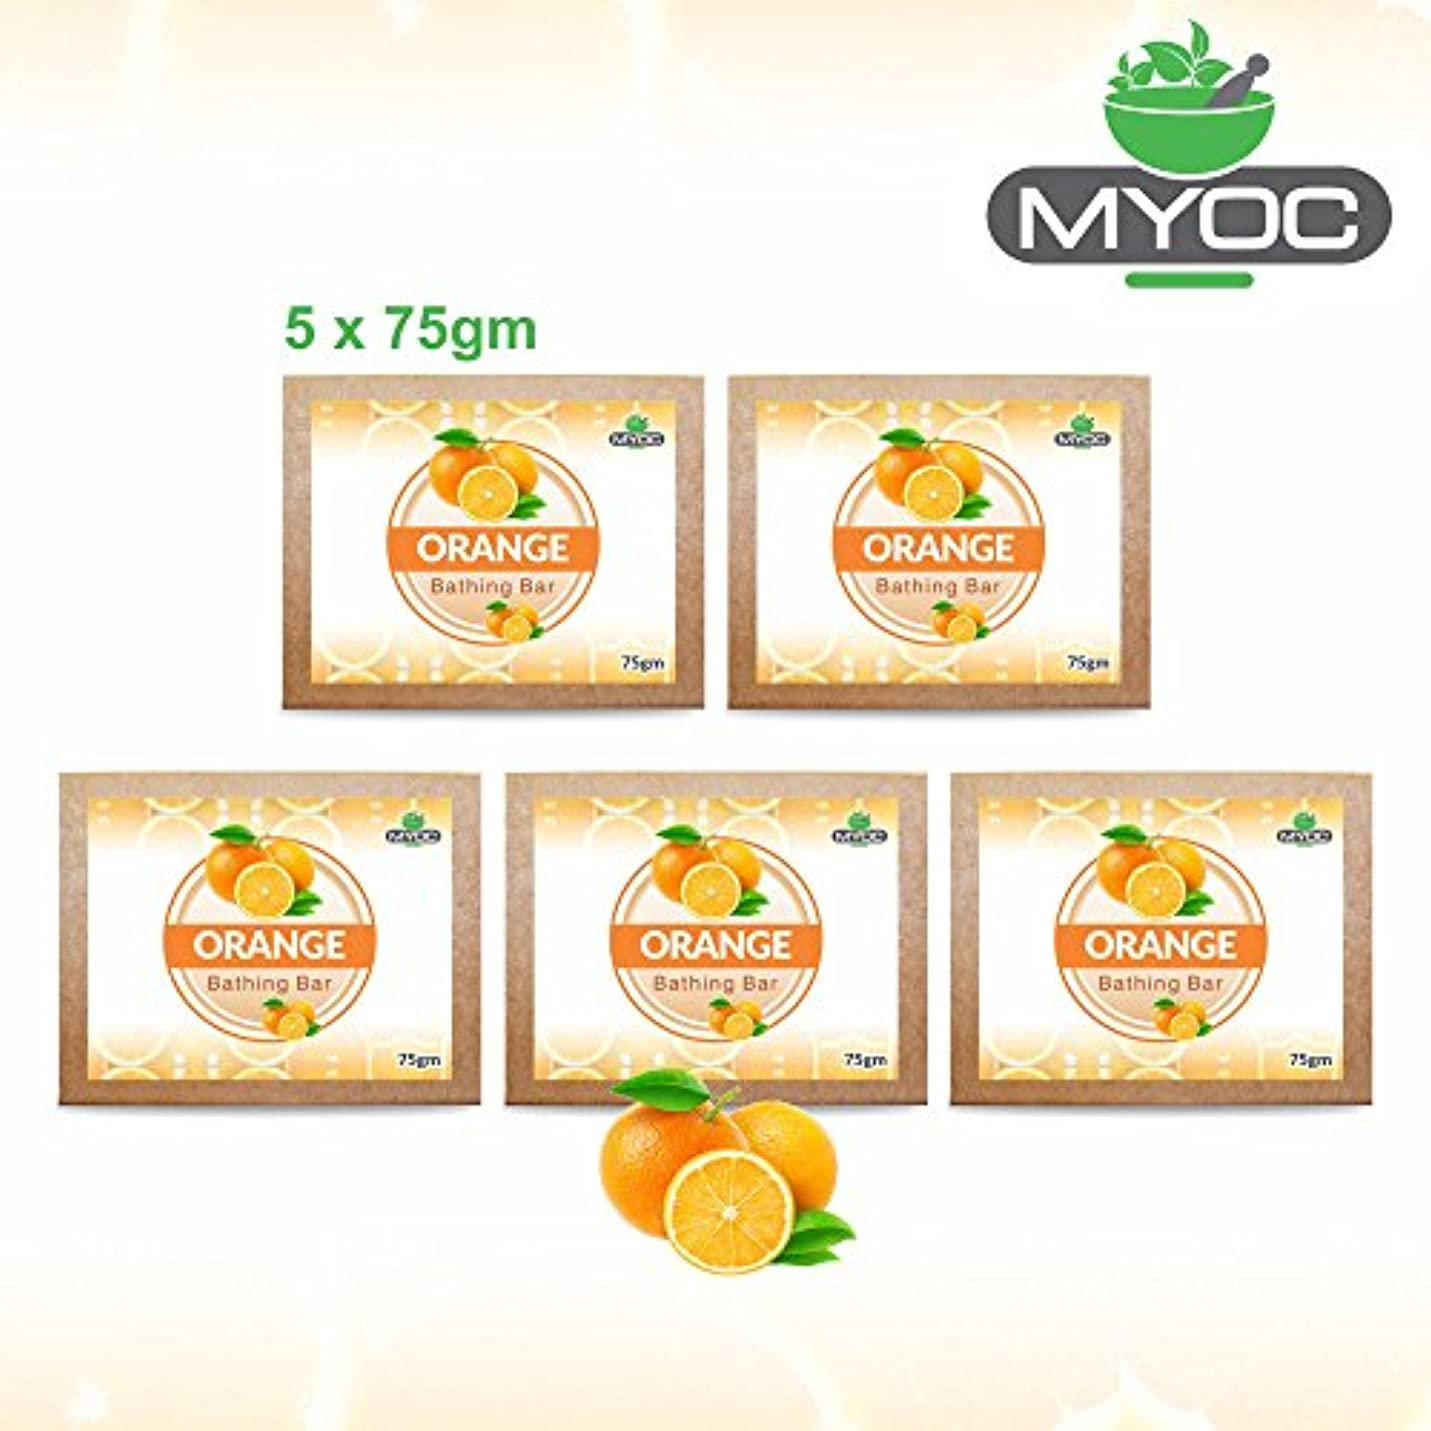 Orange soap for dull looking skin. Combats bacteria, rejuvenates skin, fights blemishes and unclog pores 75gm...